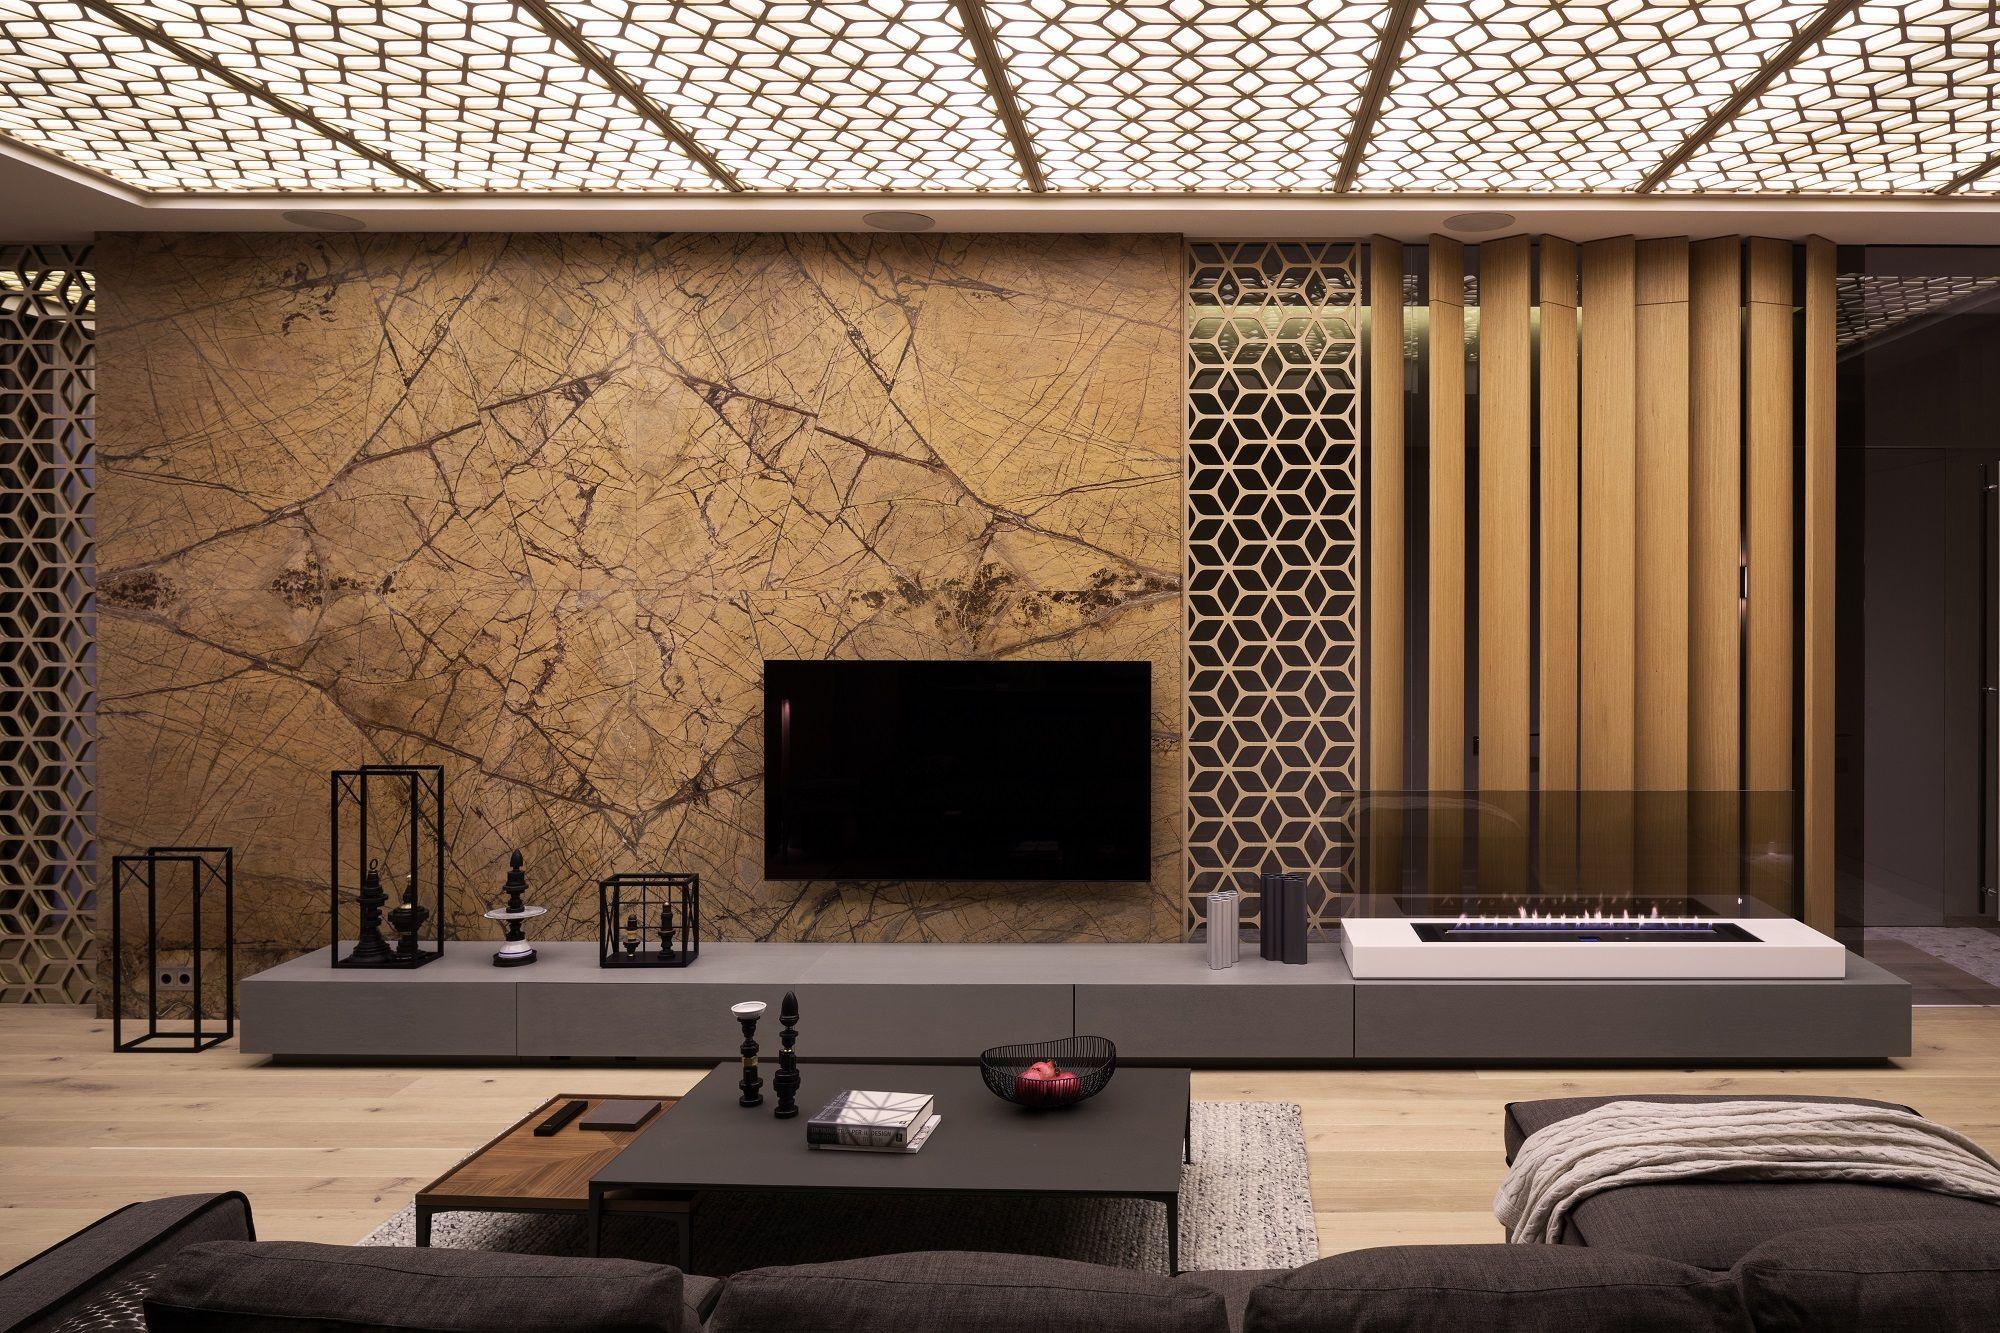 Shades of honey apartment interior design interiordesign livingroom also rh pinterest